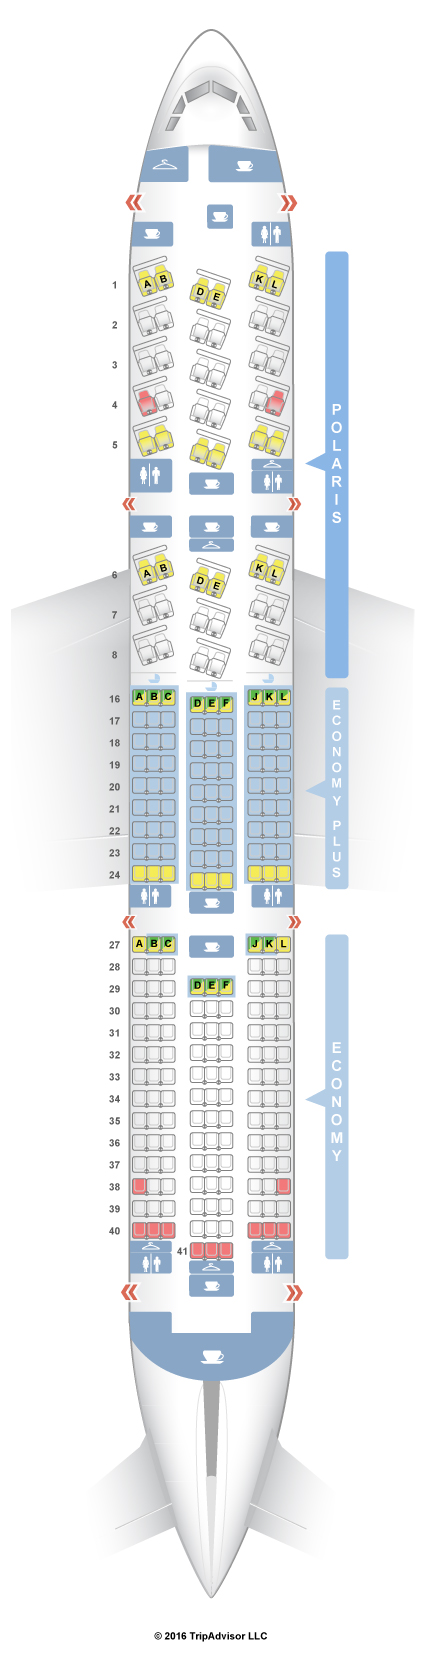 seatguru seat map united boeing 787 9 789